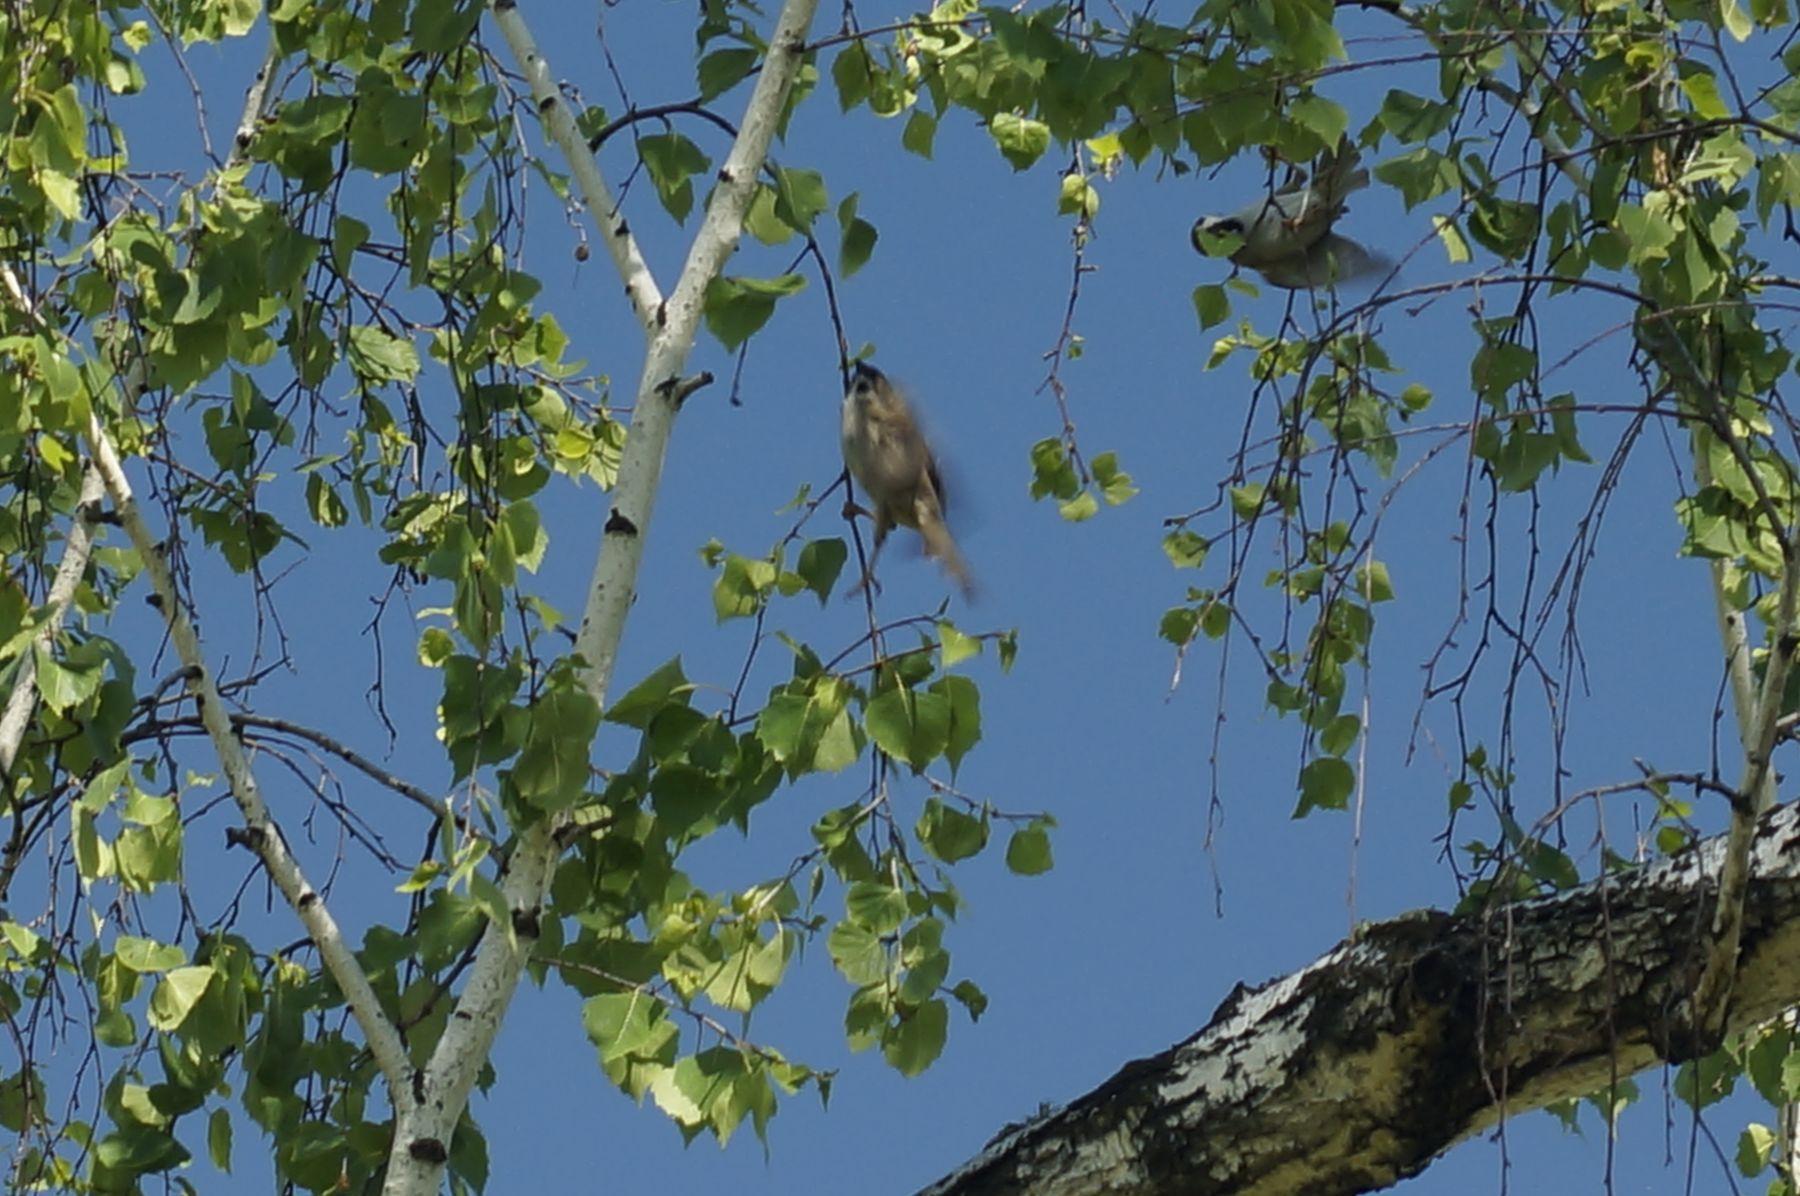 Остановись мгновение птицы лето лес береза